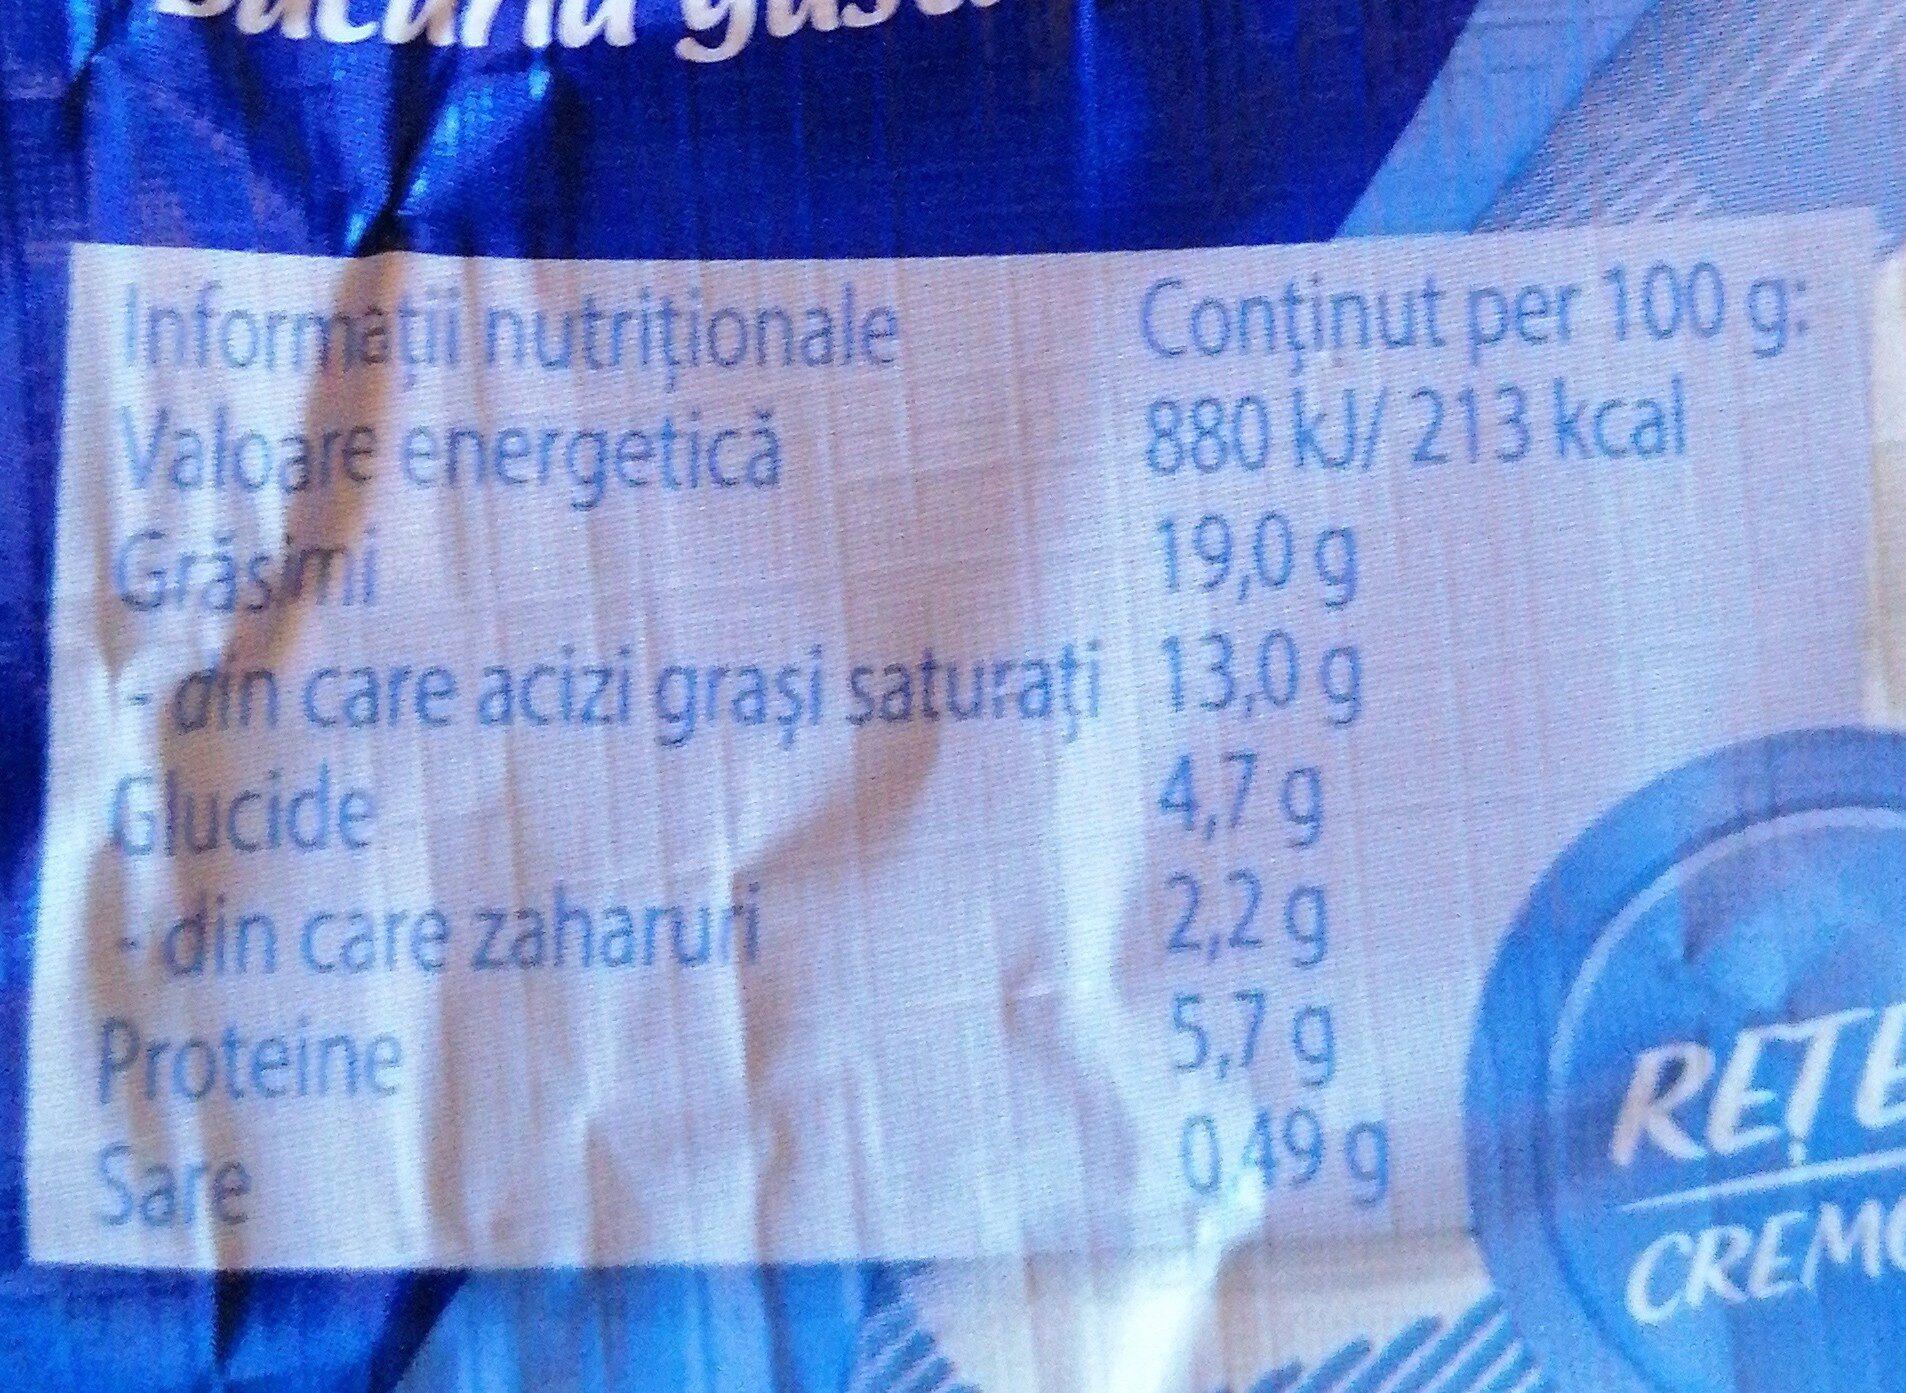 Hochland Crème Clasic - Informations nutritionnelles - ro